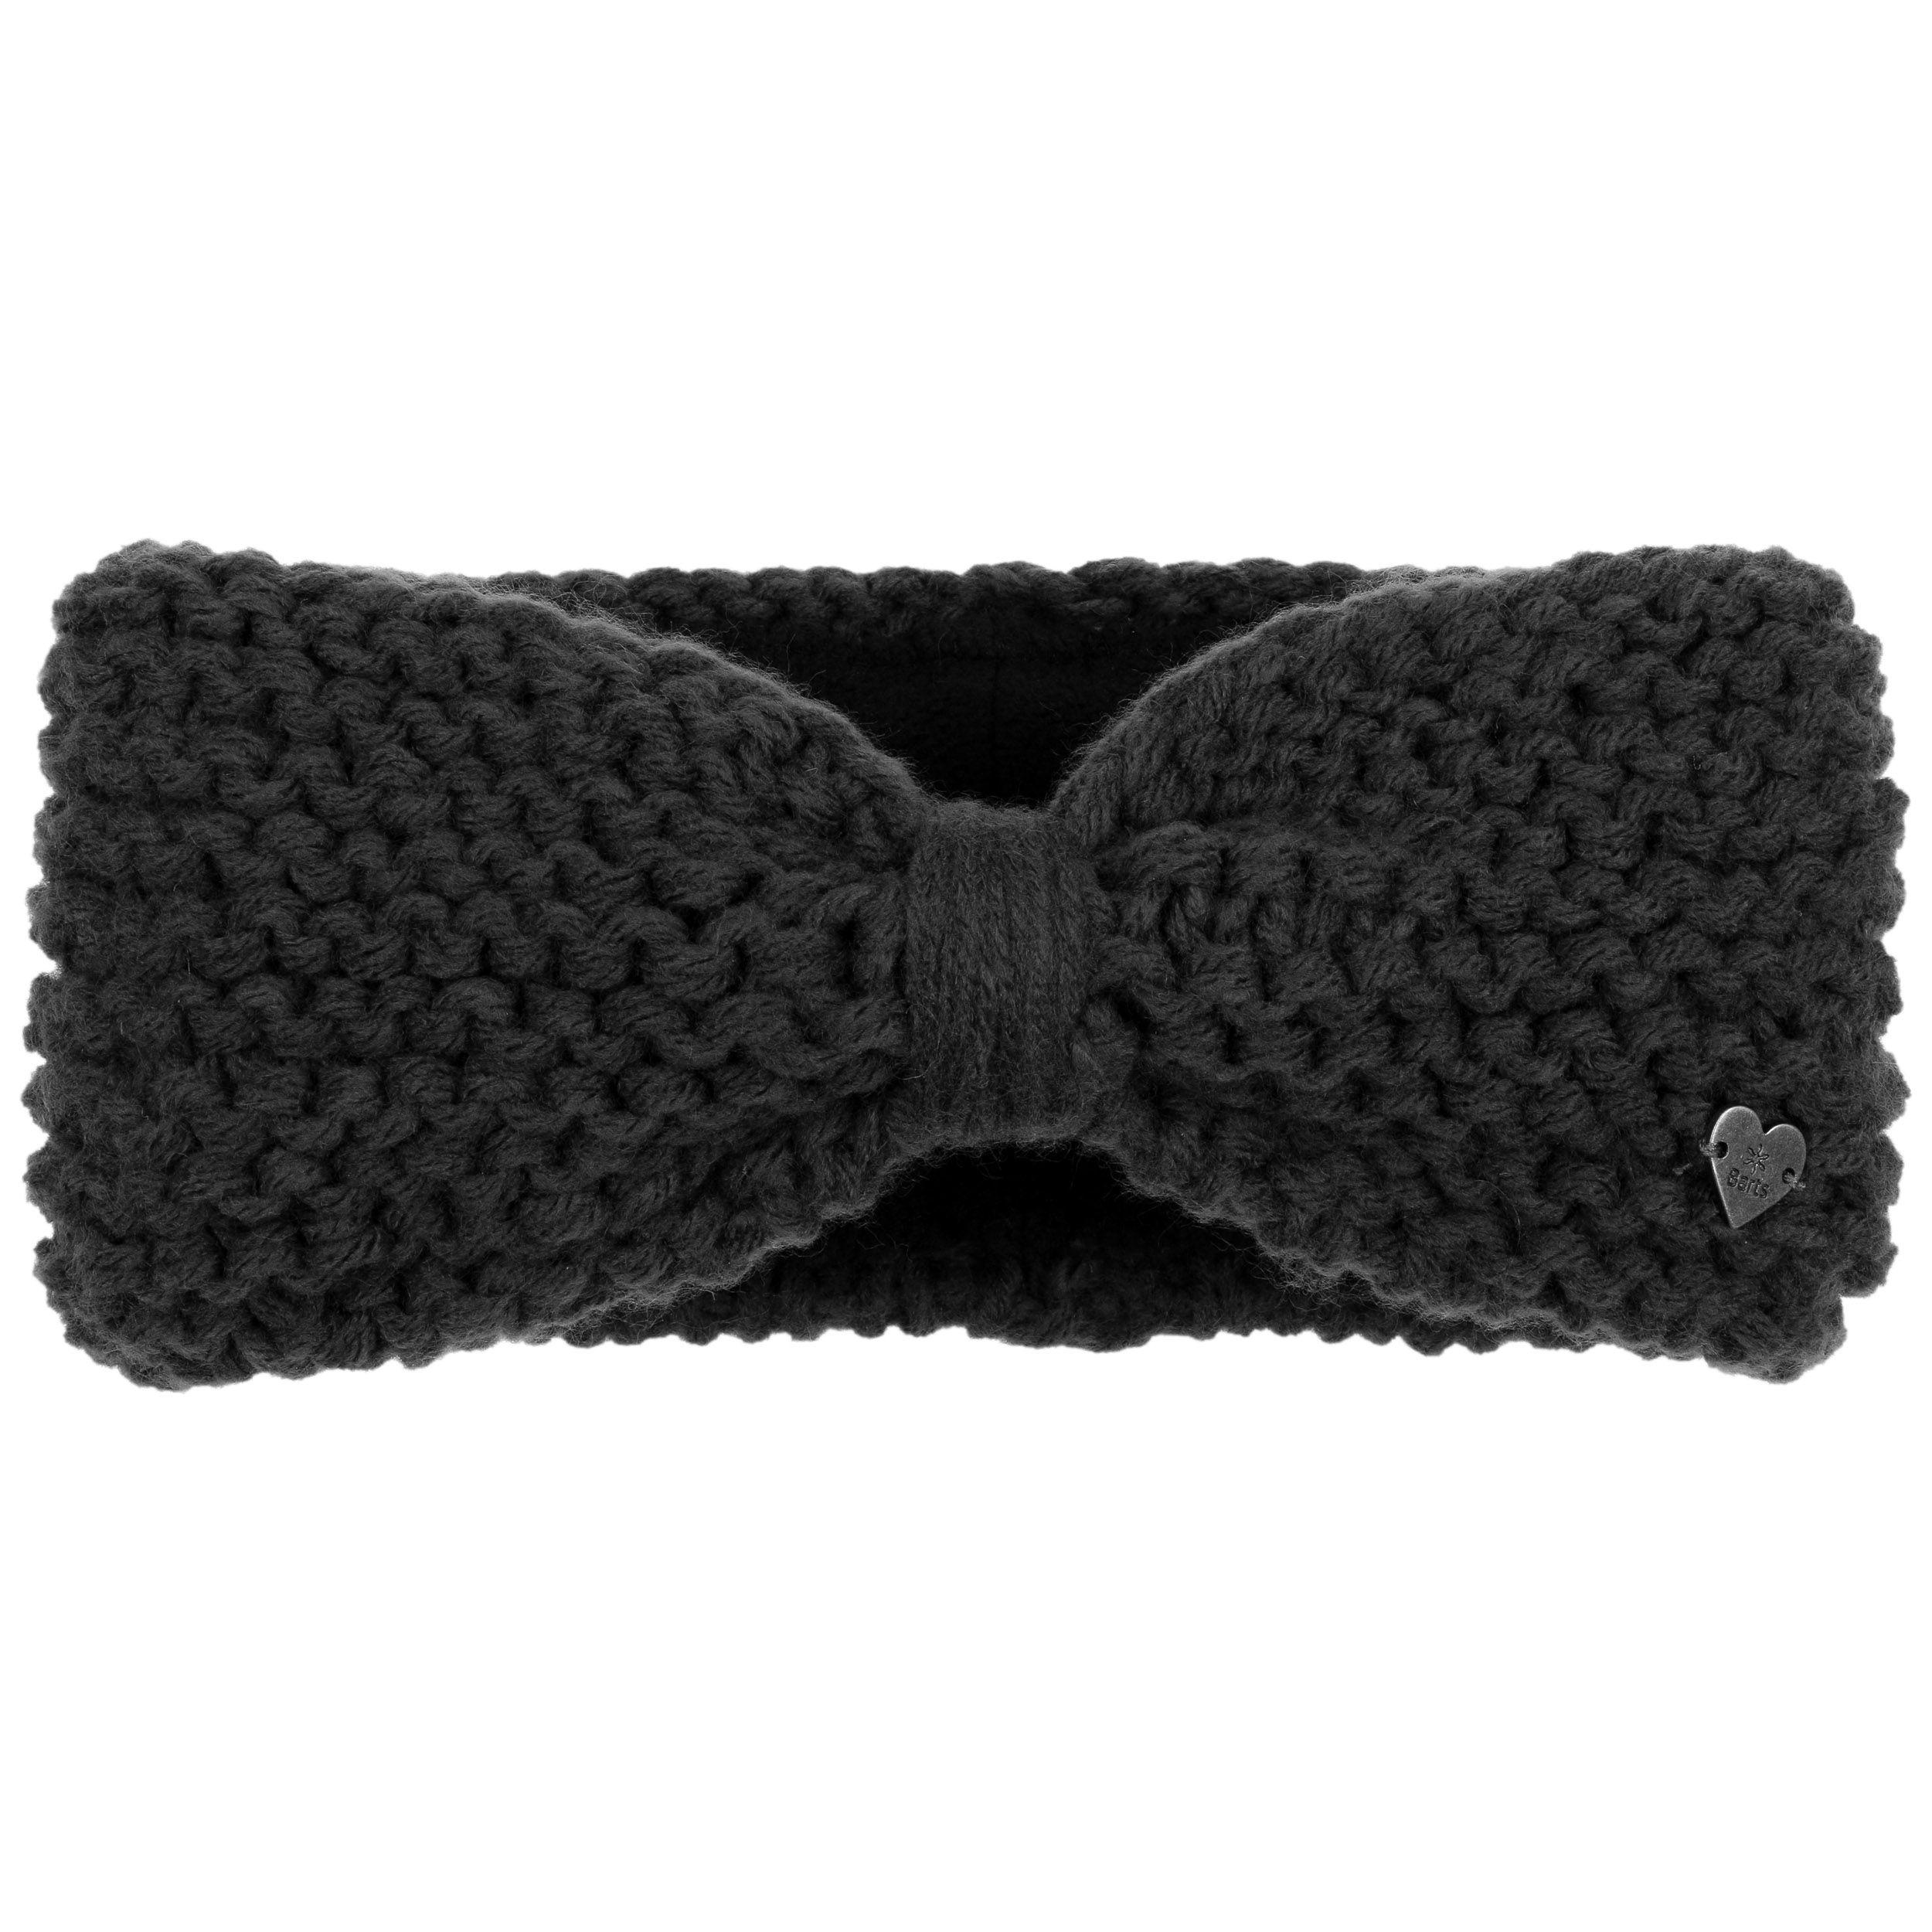 Ginge Uni Stirnband by Barts | StrickLiesel | Pinterest ...